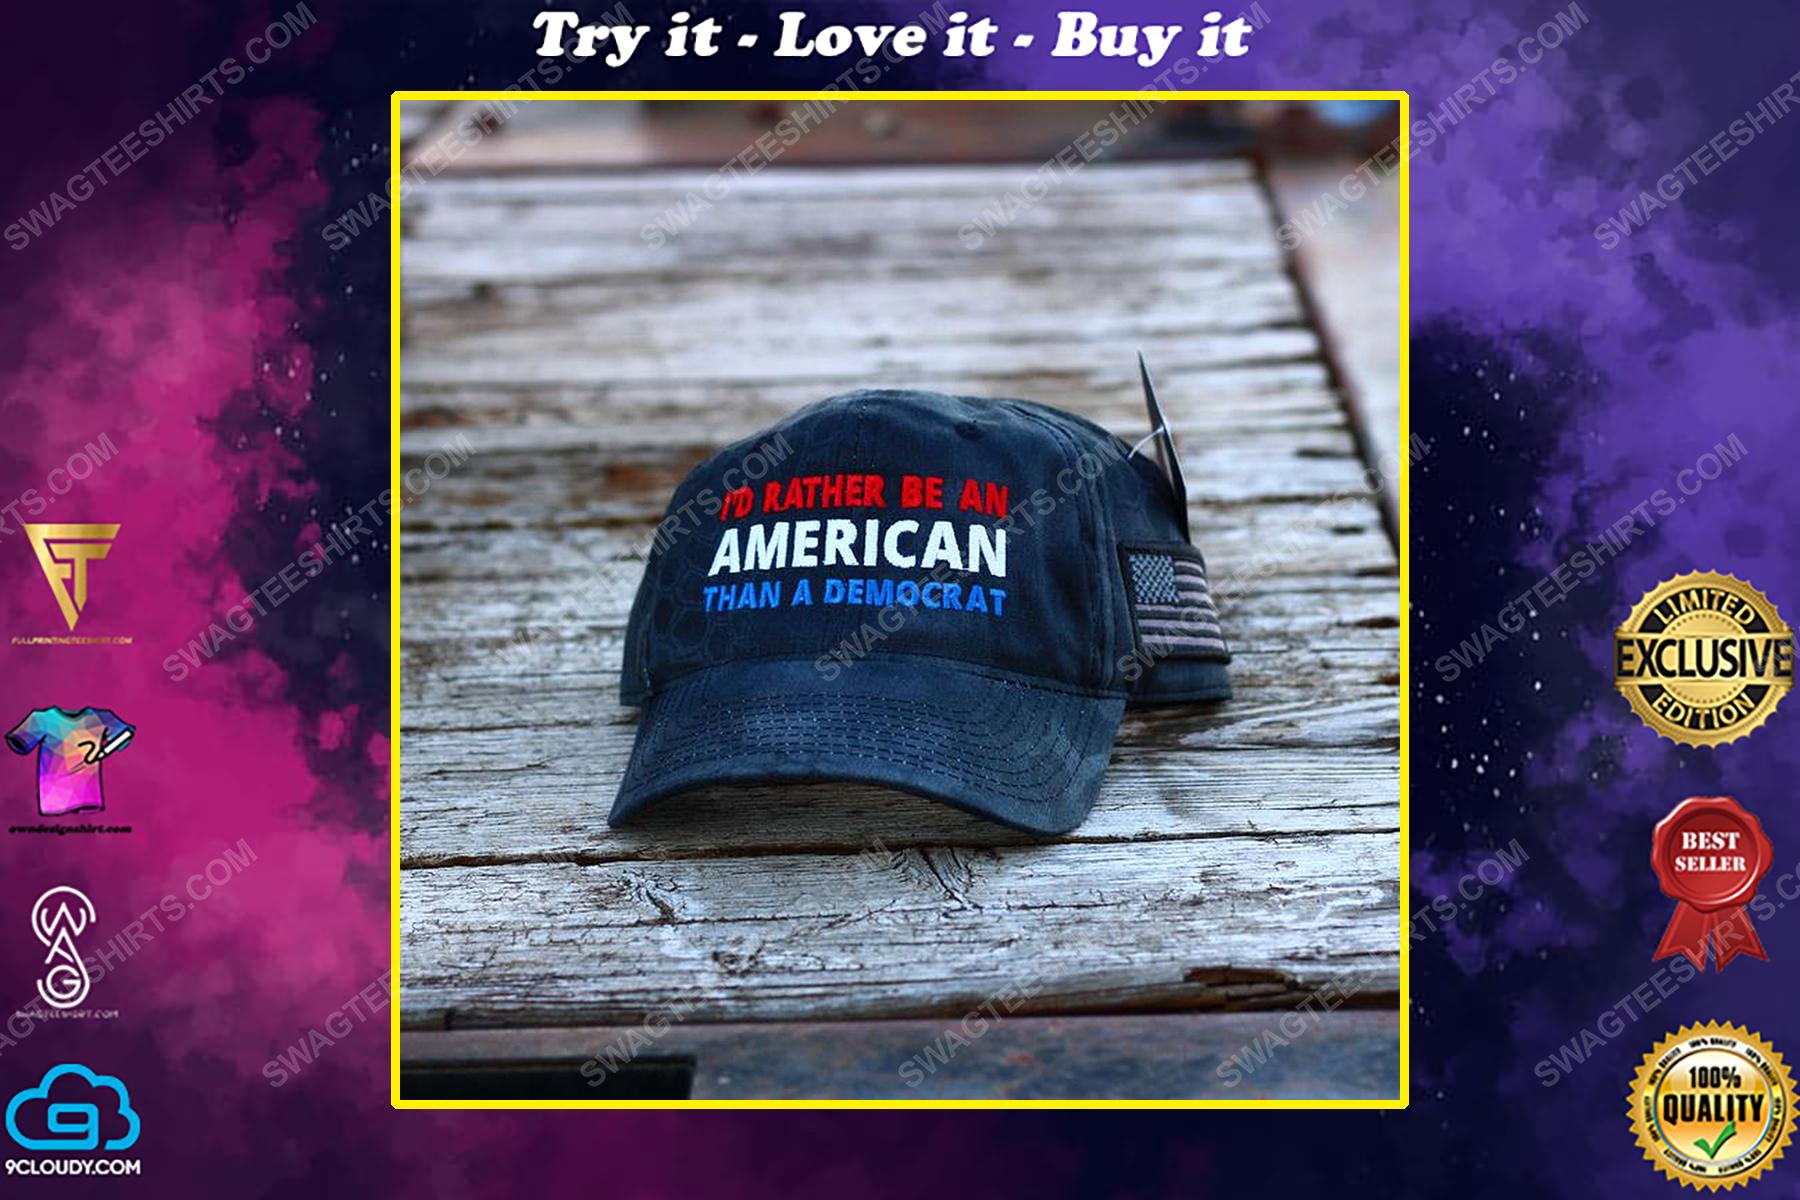 I'd rather be an american than a democrat full print classic hat